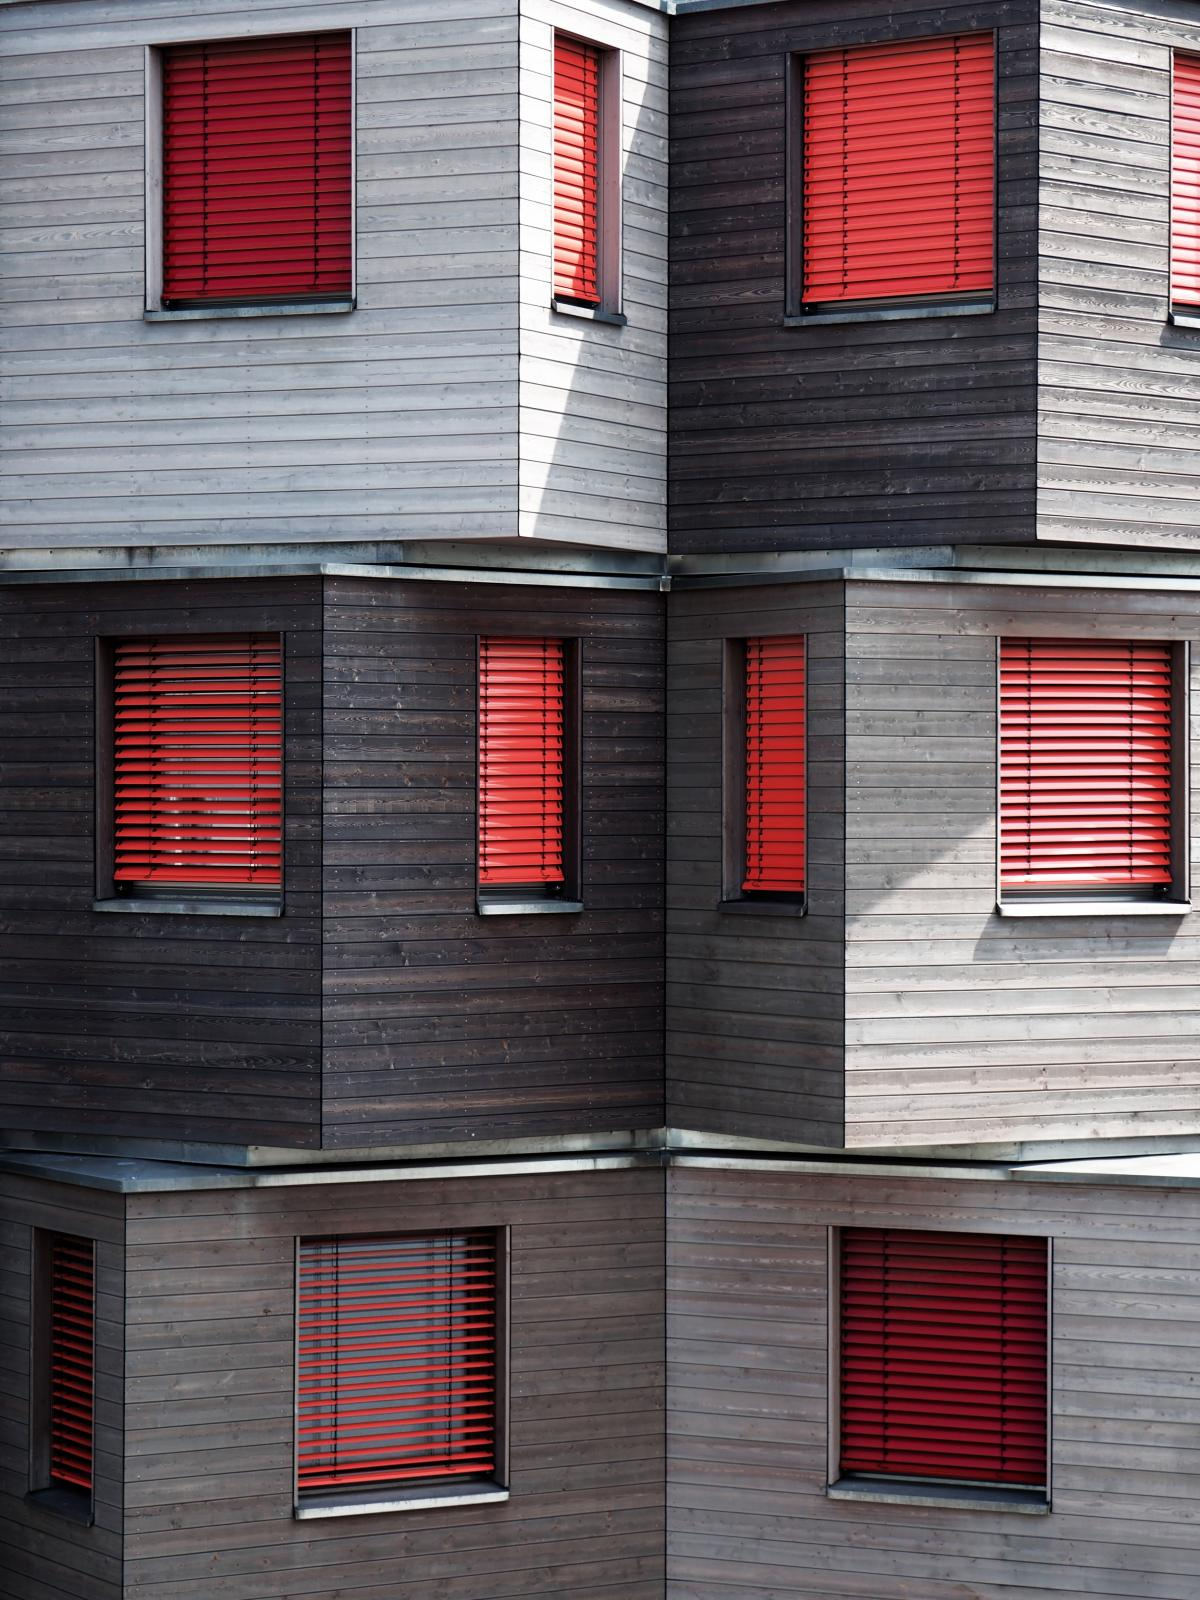 Building Architecture Barbershop